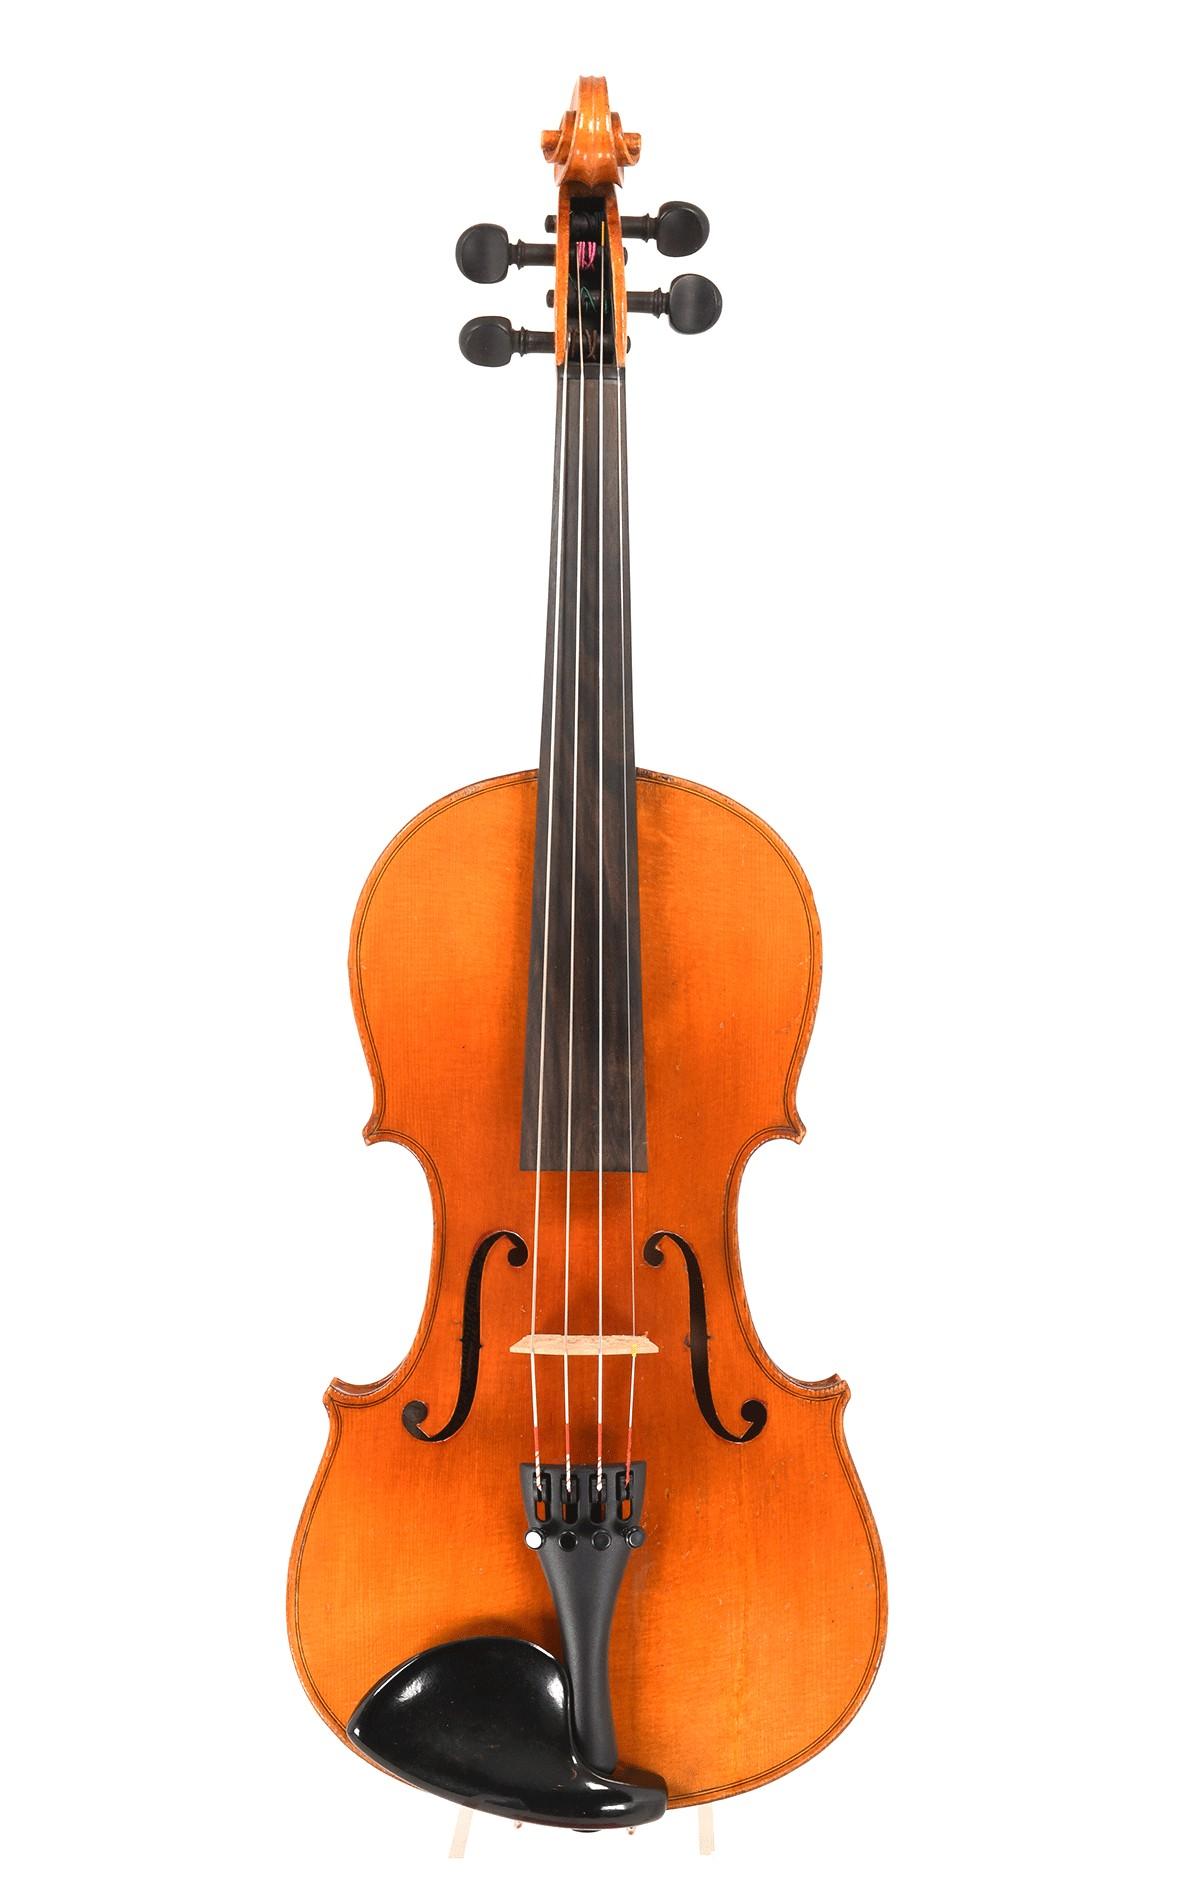 Bon Mittenwald violon 3/4 de 1933